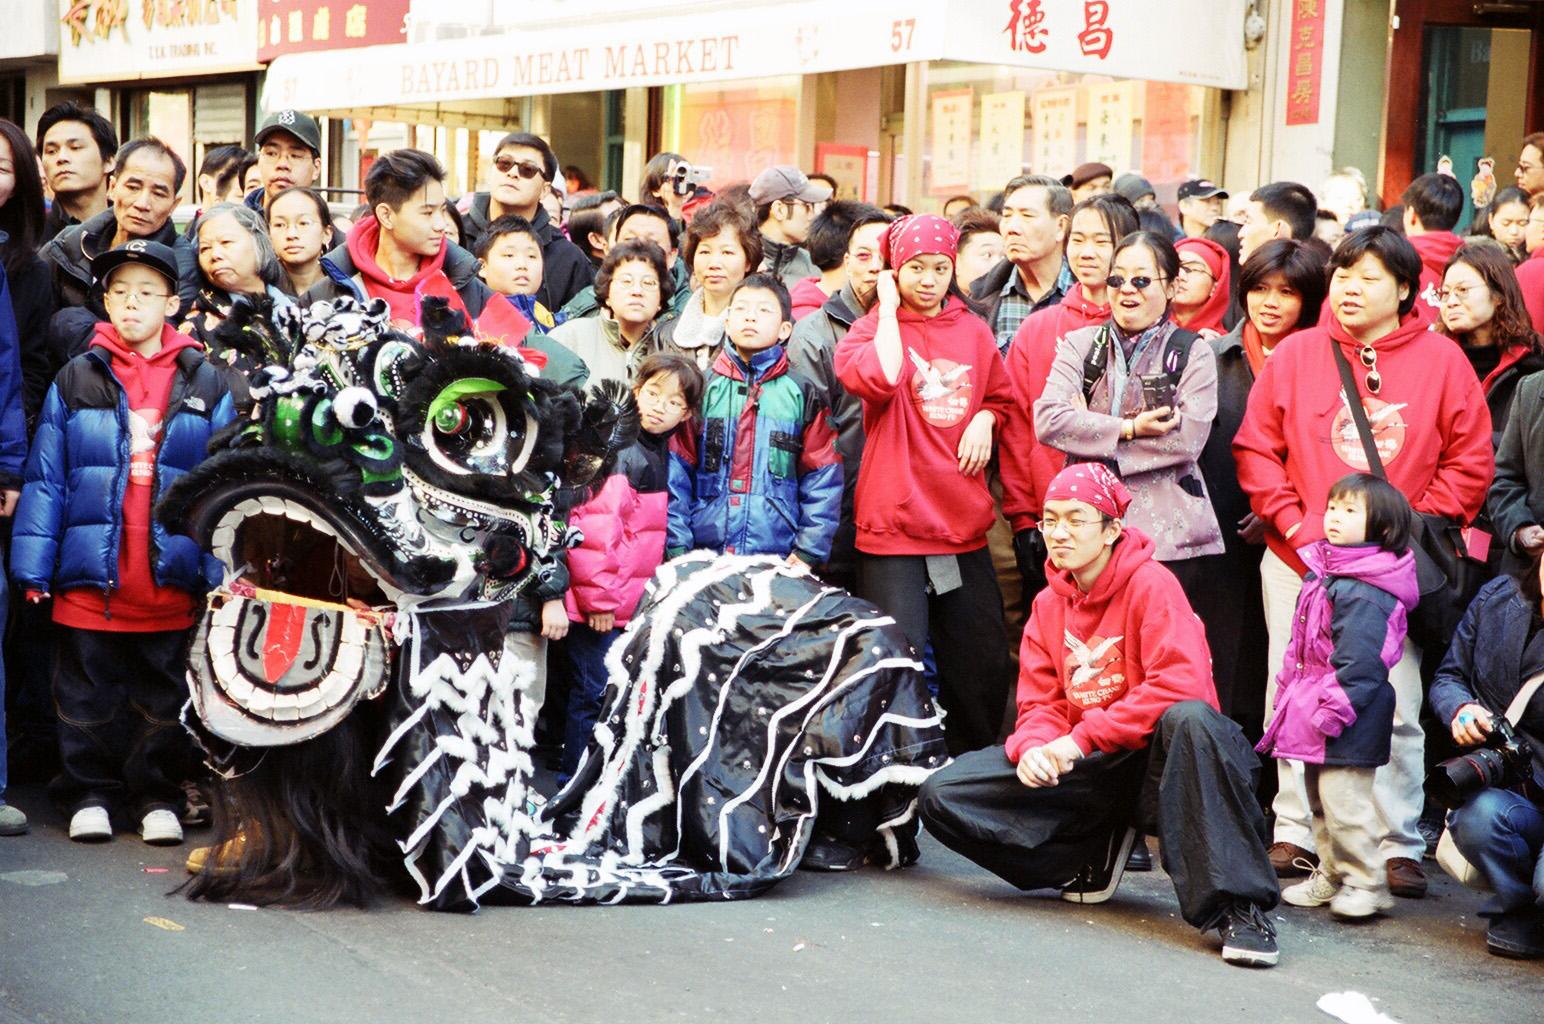 black lion costume and spectators during chinese new year parade new york chinatown 2002 - Chinese New Year 2002